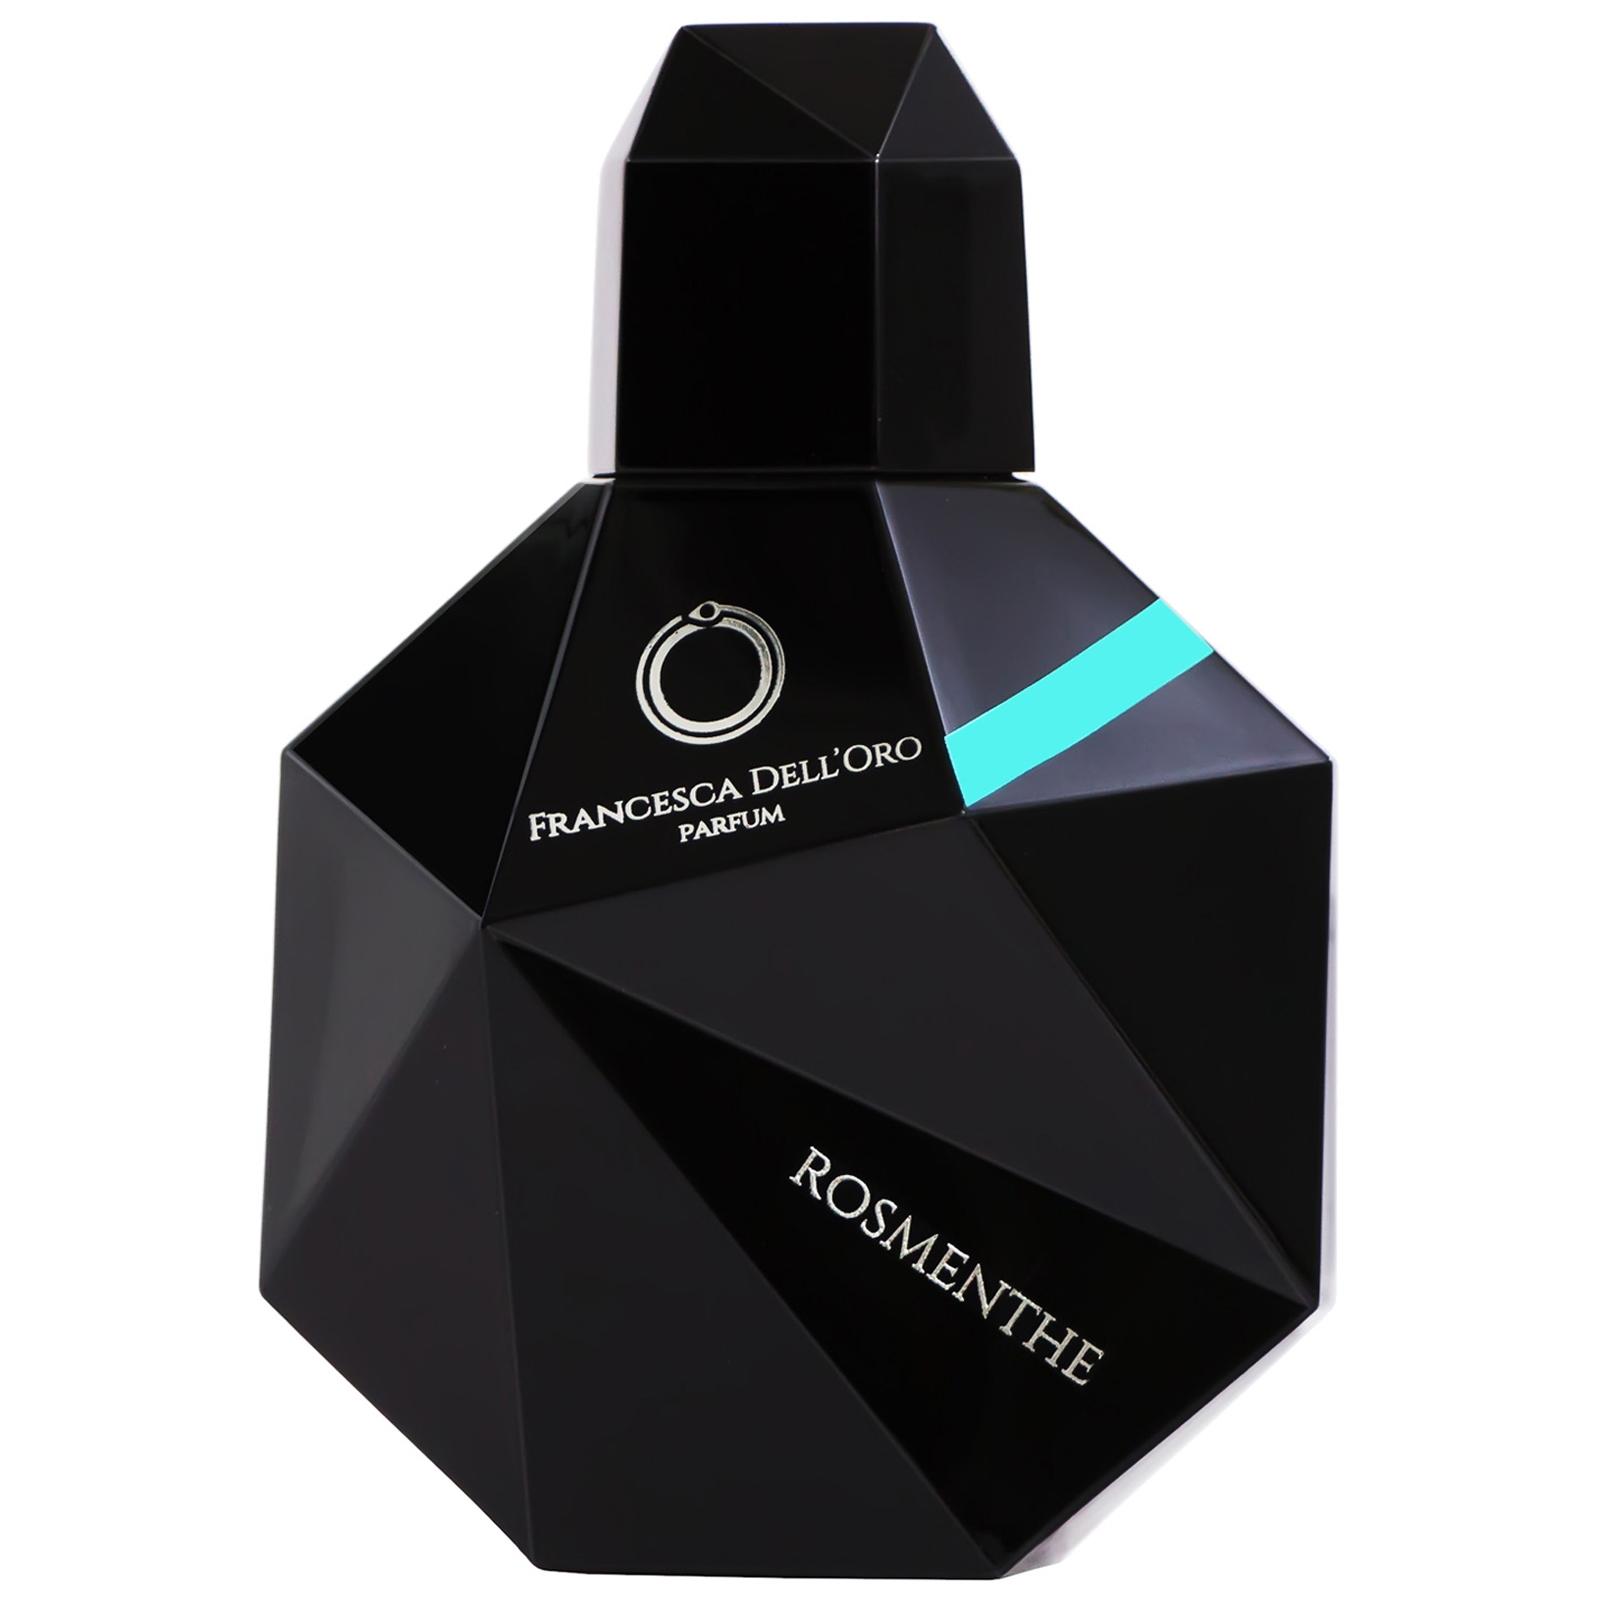 Rosmenthe profumo eau de parfum 100 ml